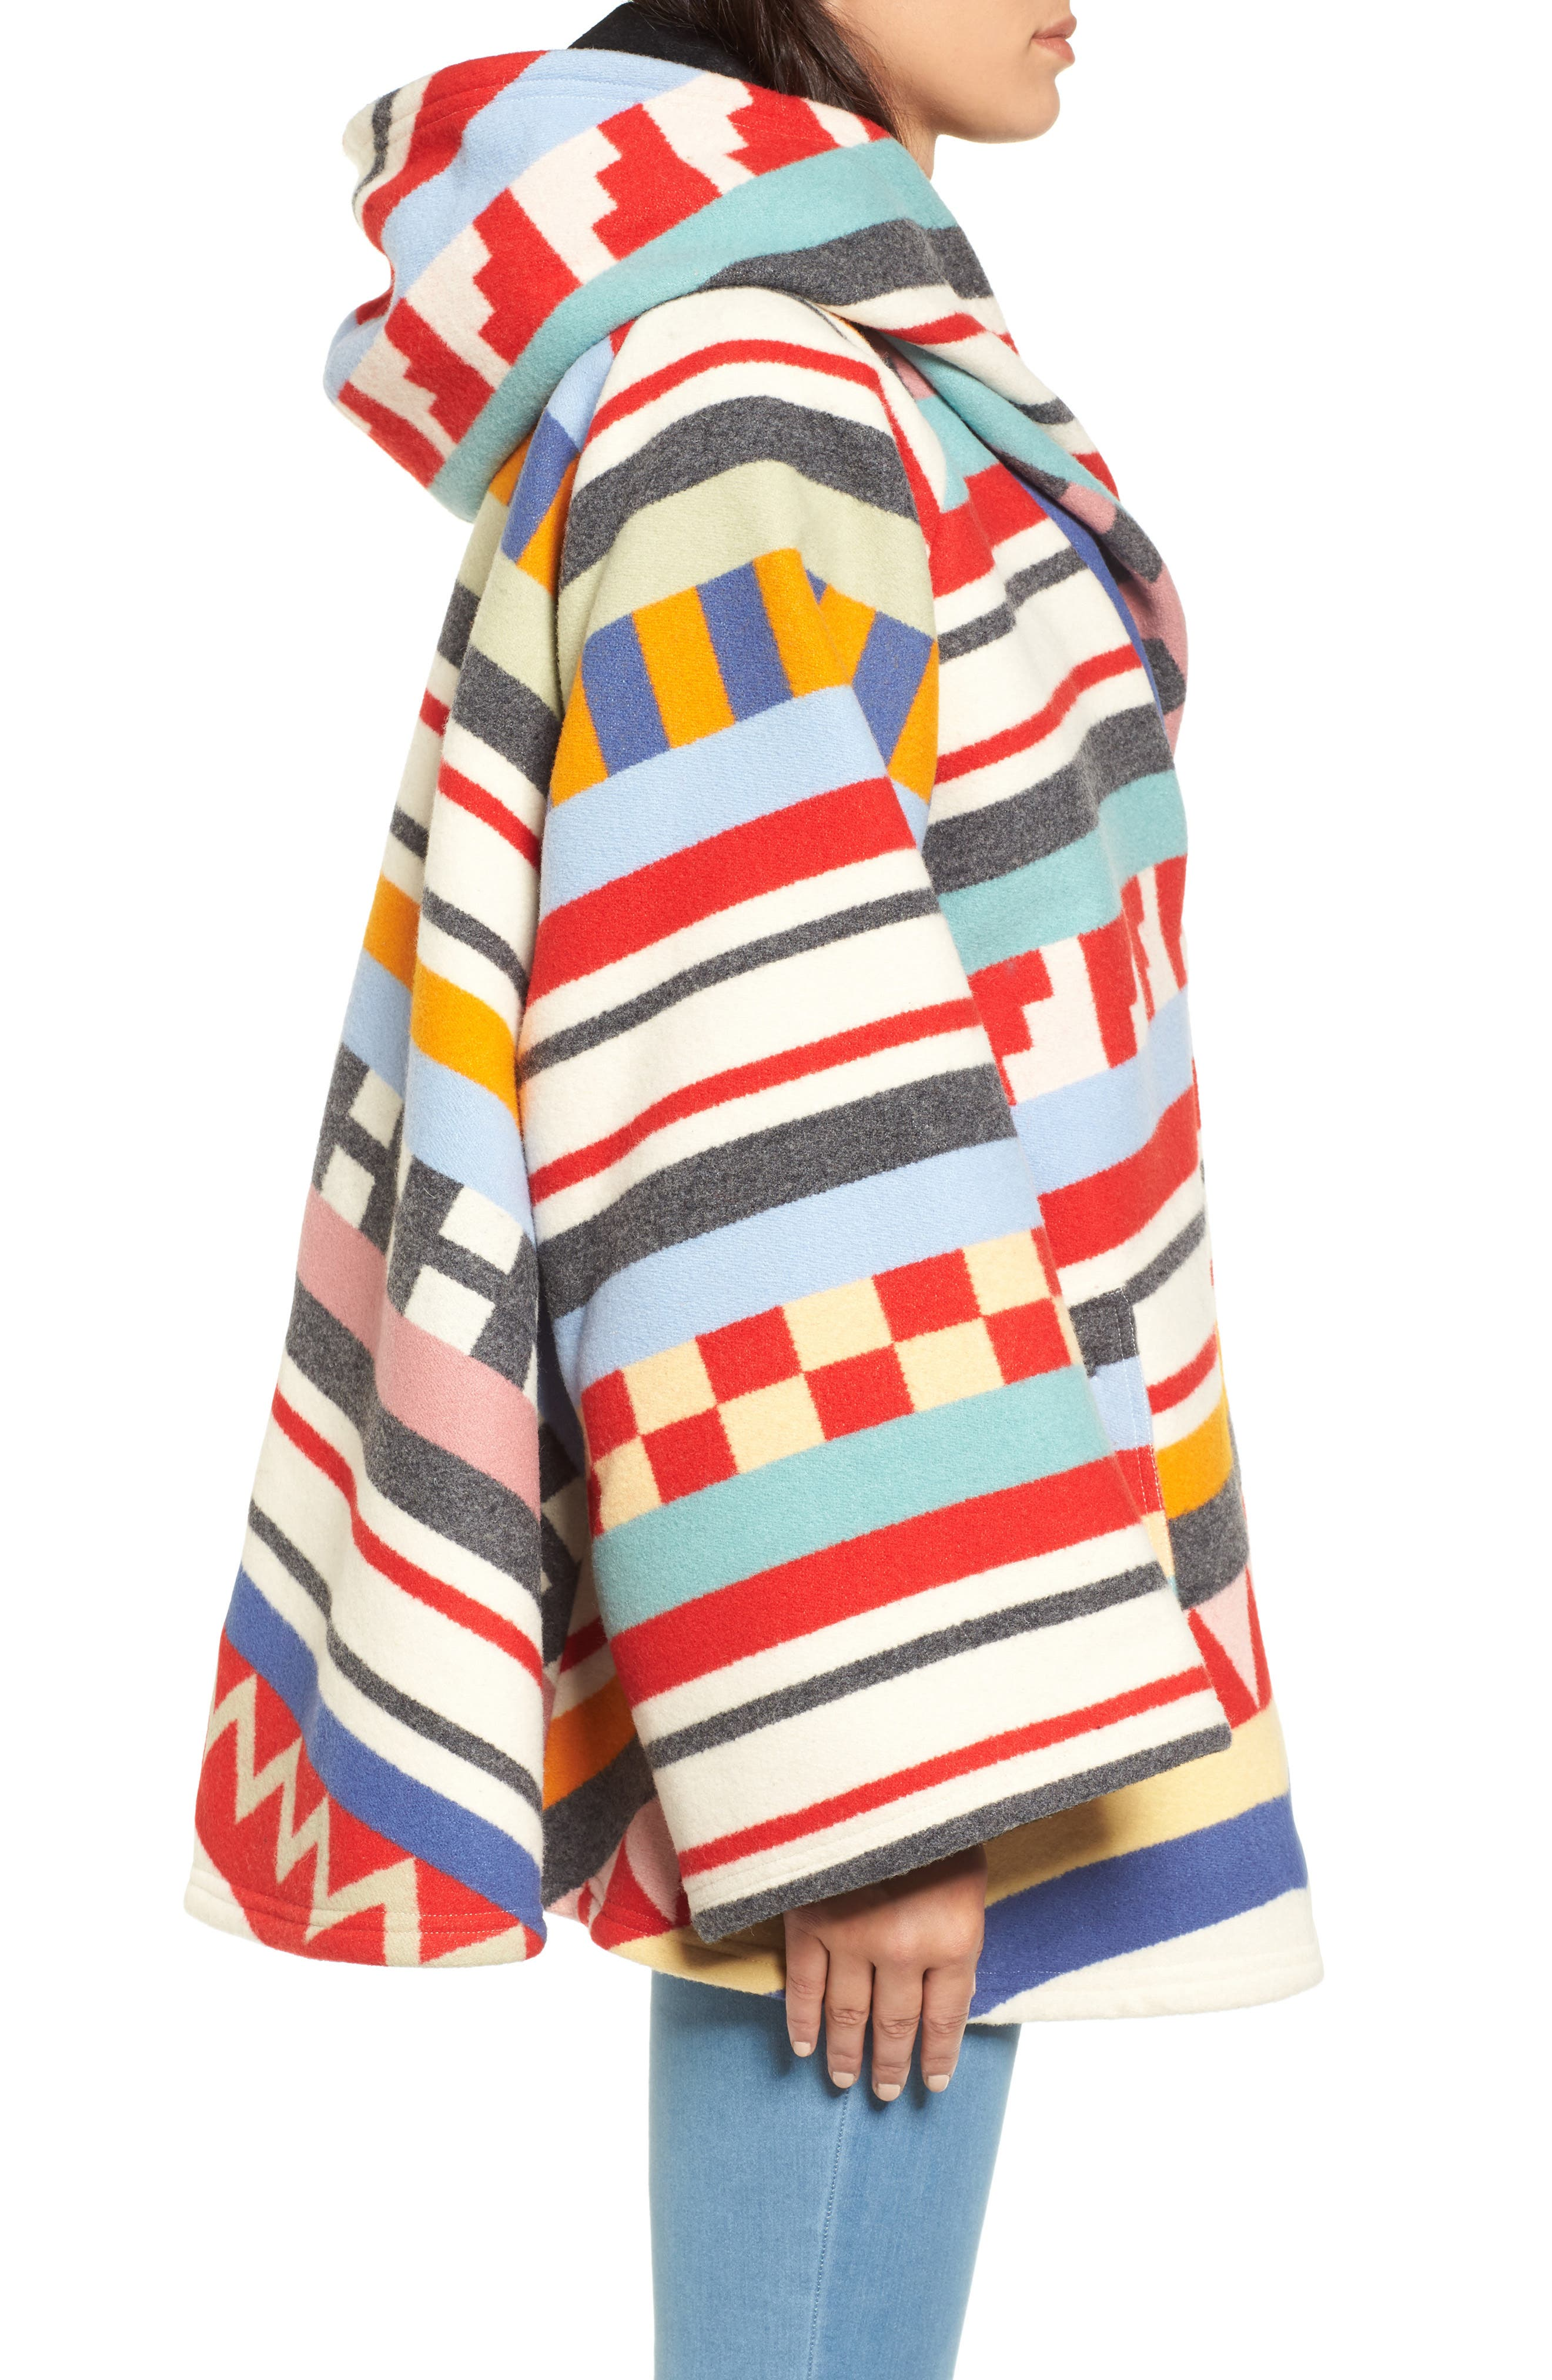 x Pendleton Wool Blend Hooded Cape,                             Alternate thumbnail 3, color,                             White Multi